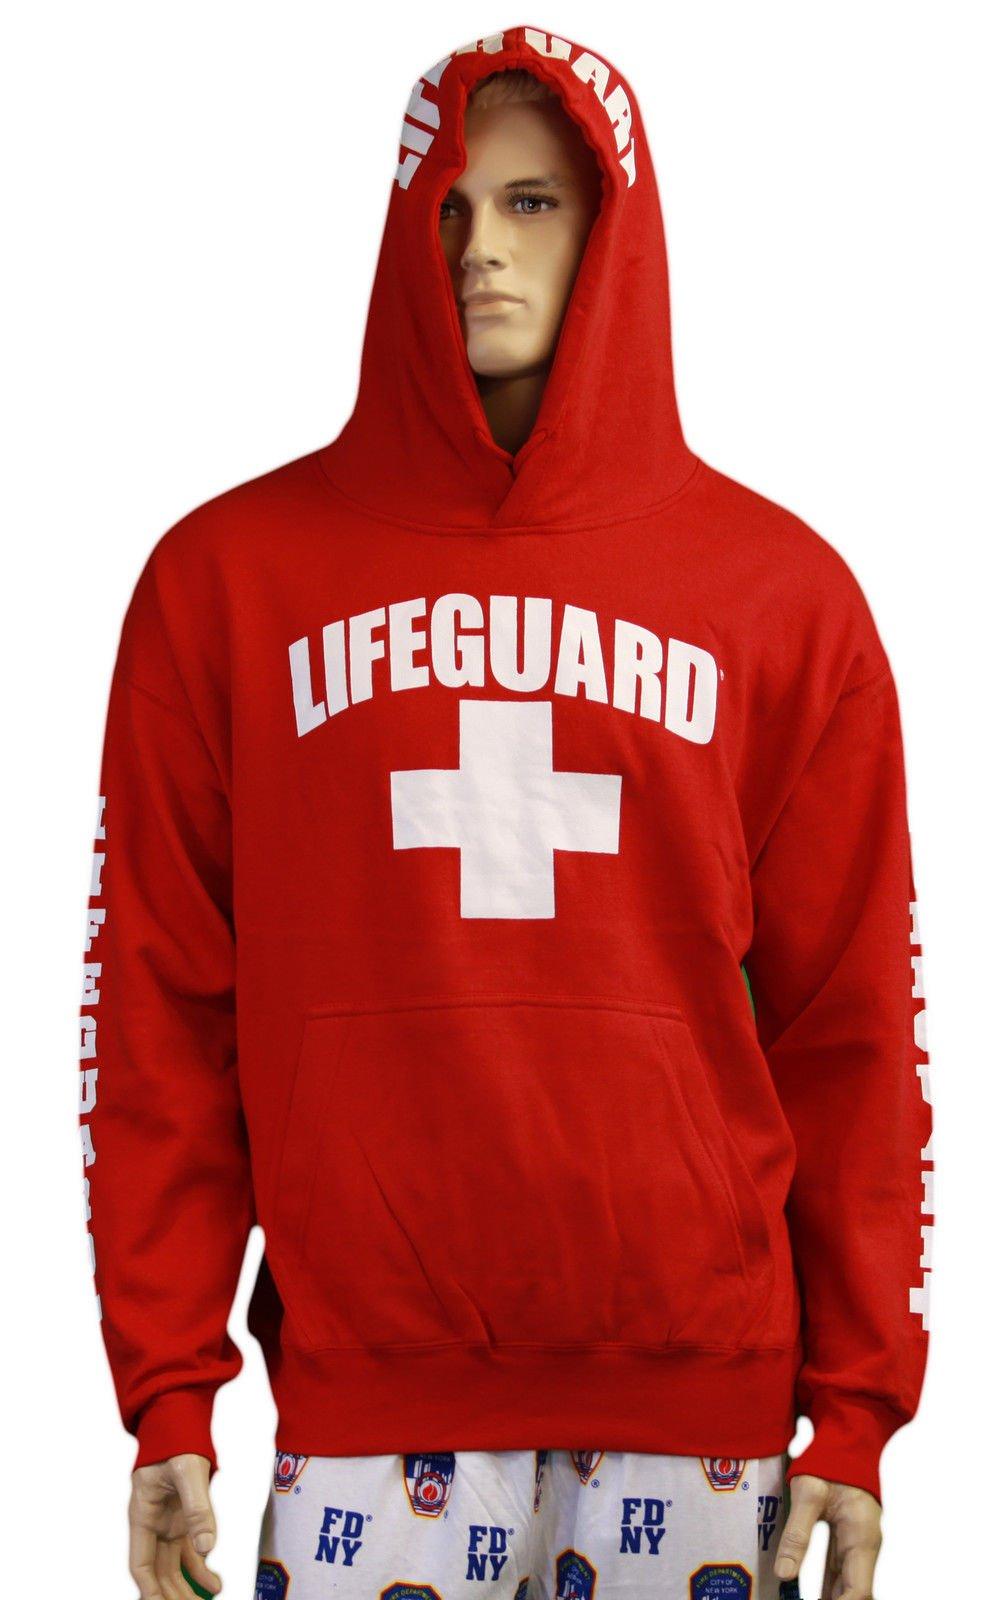 963b59c1b40e Lifeguard life guard adult pullover hoodie sweatshirt adult red jpg  993x1600 Lifeguard sweatshirt myrtle beach